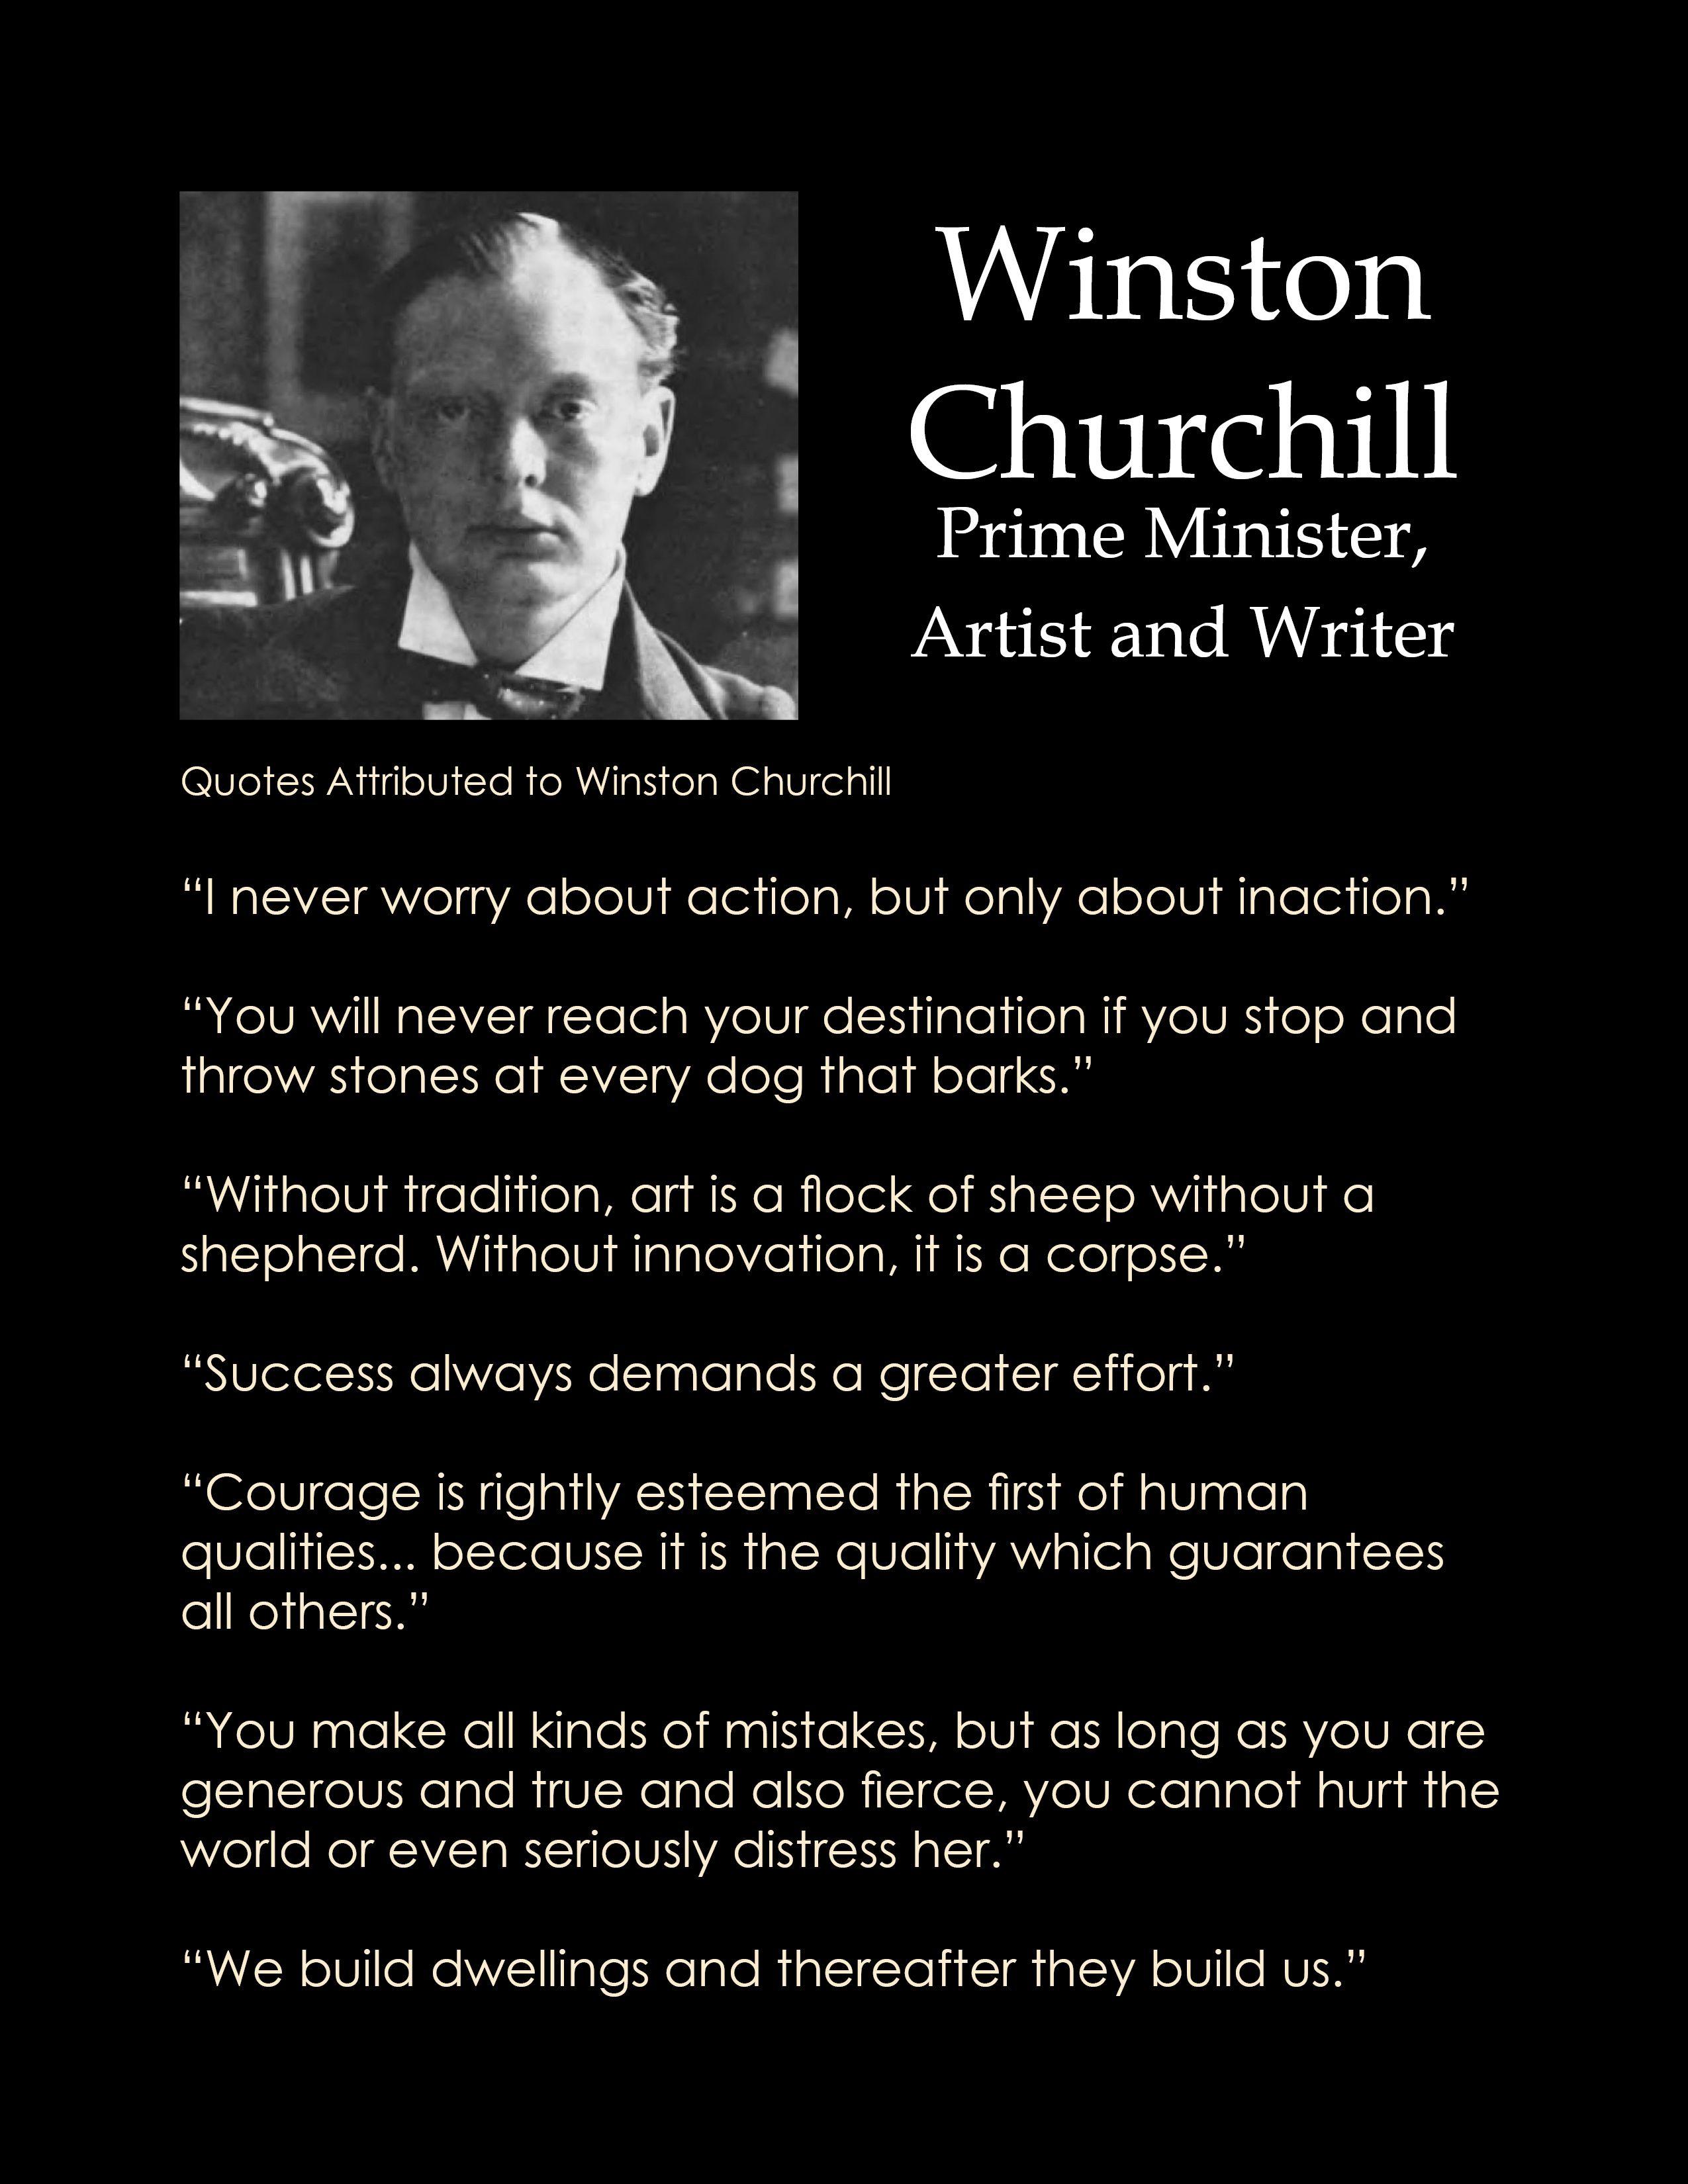 Quick Question on Winston Churchill's